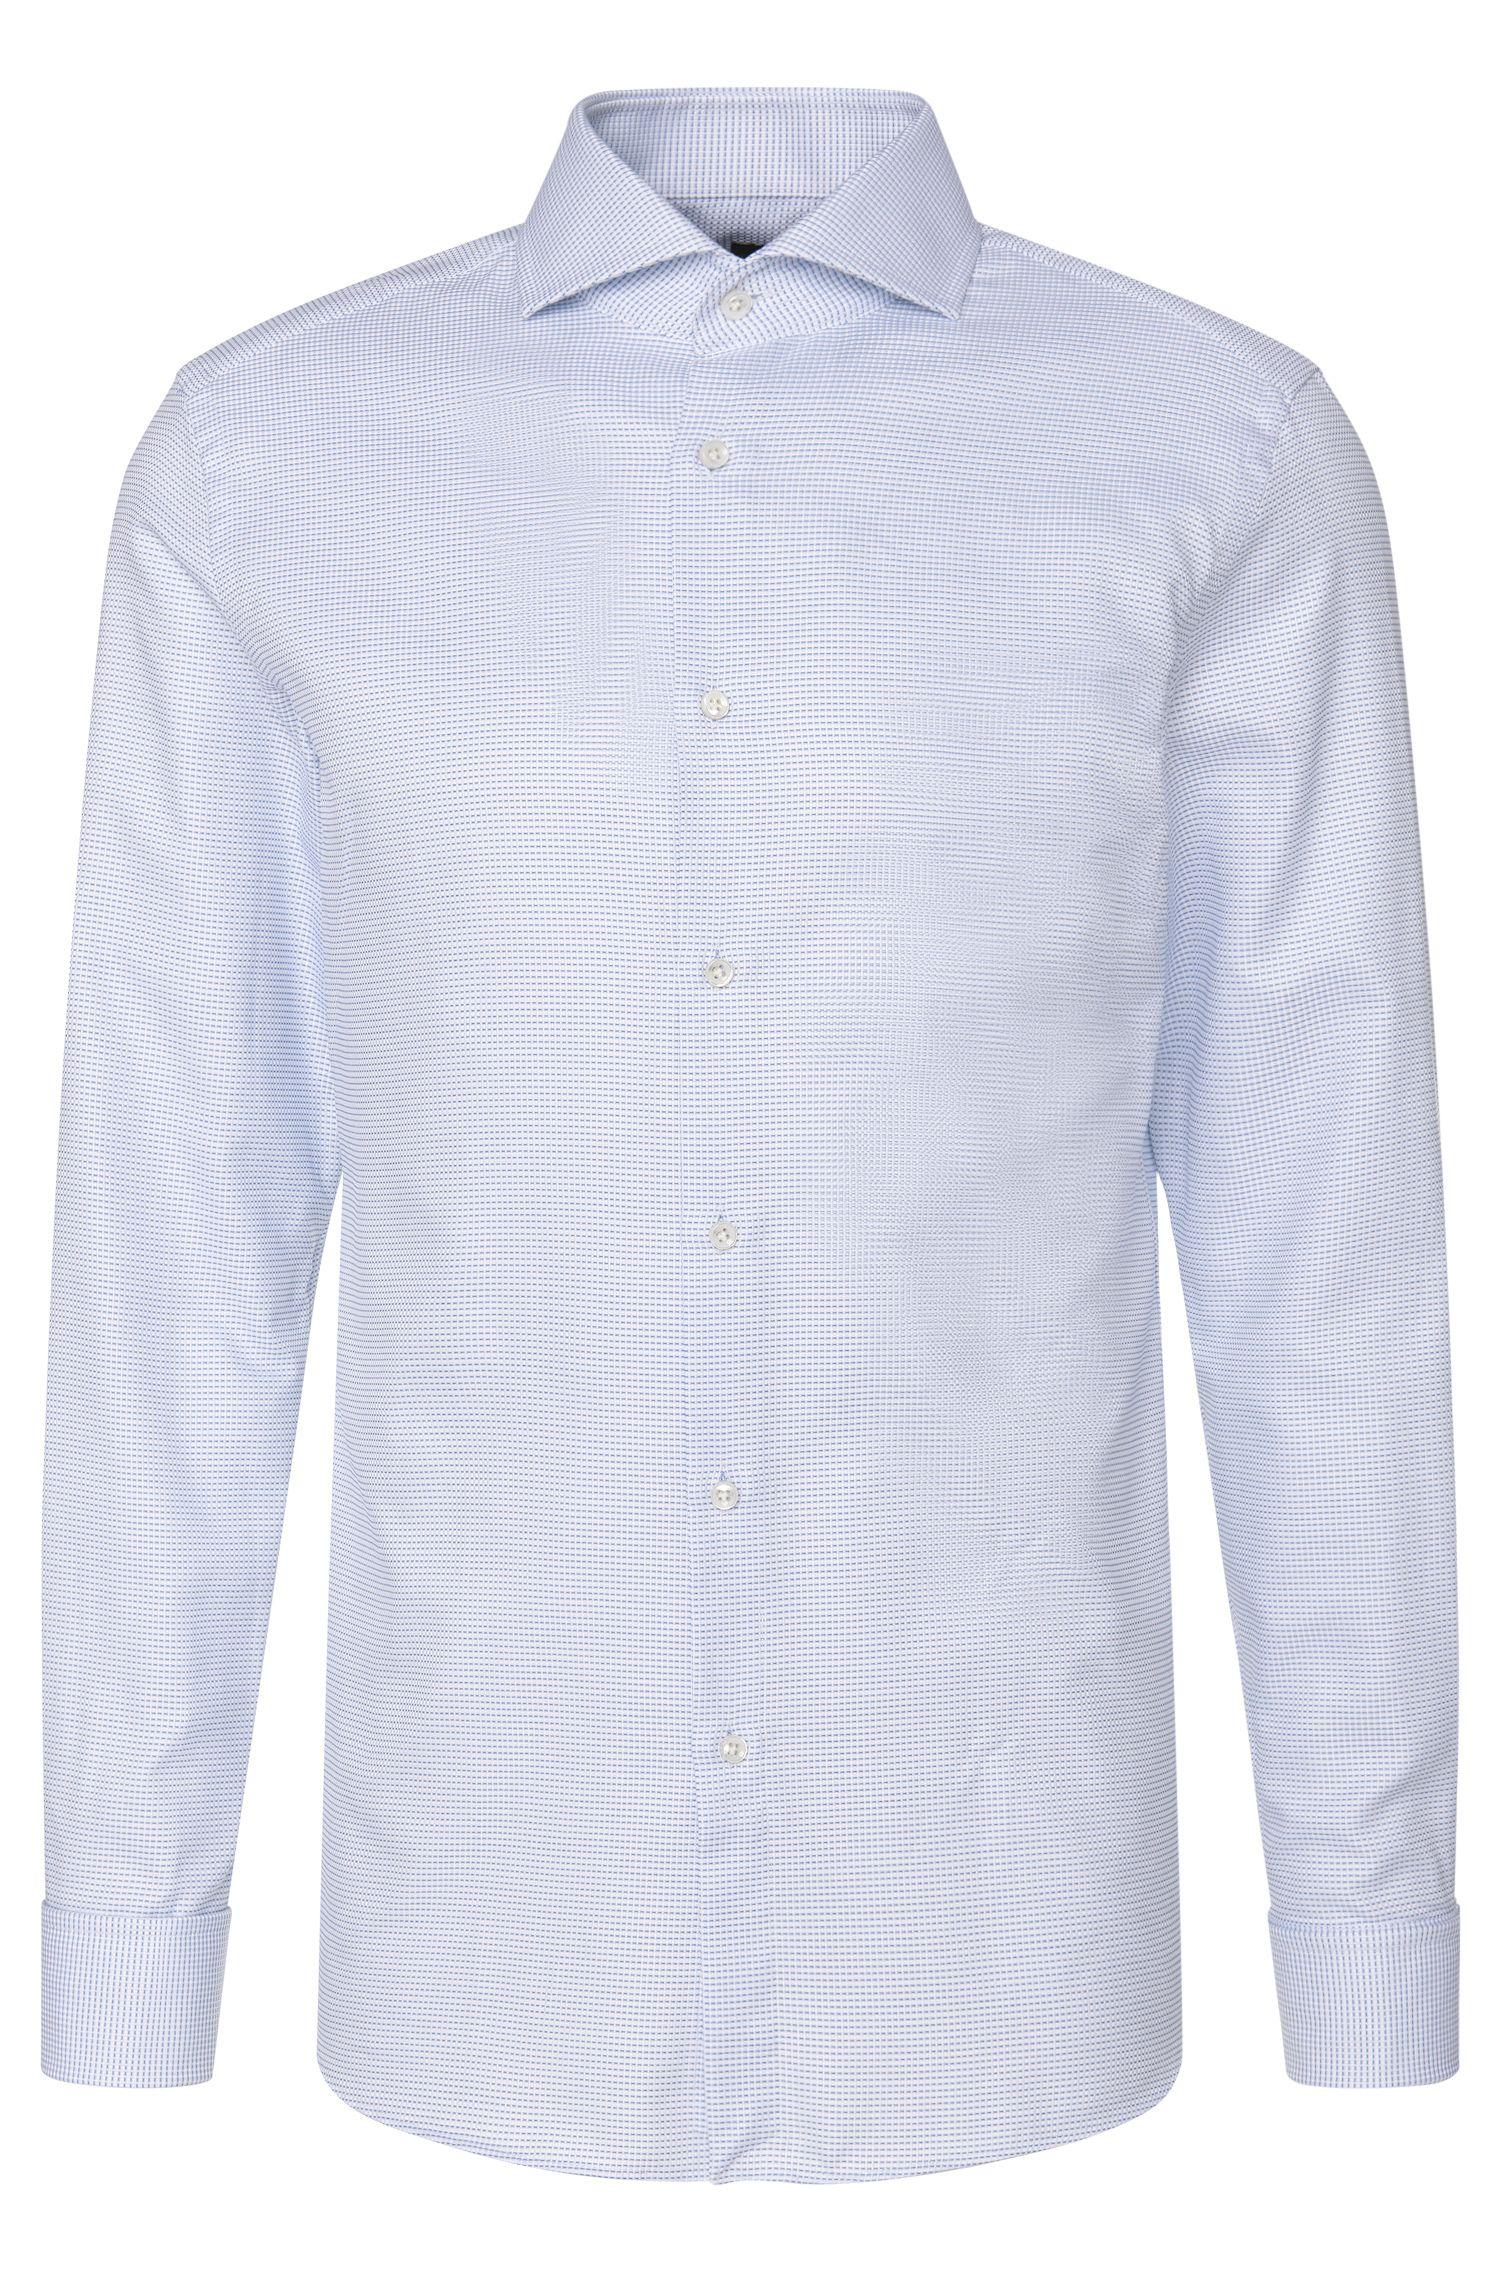 Dobby Italian Cotton Dress Shirt, Slim Fit  T-Yacob